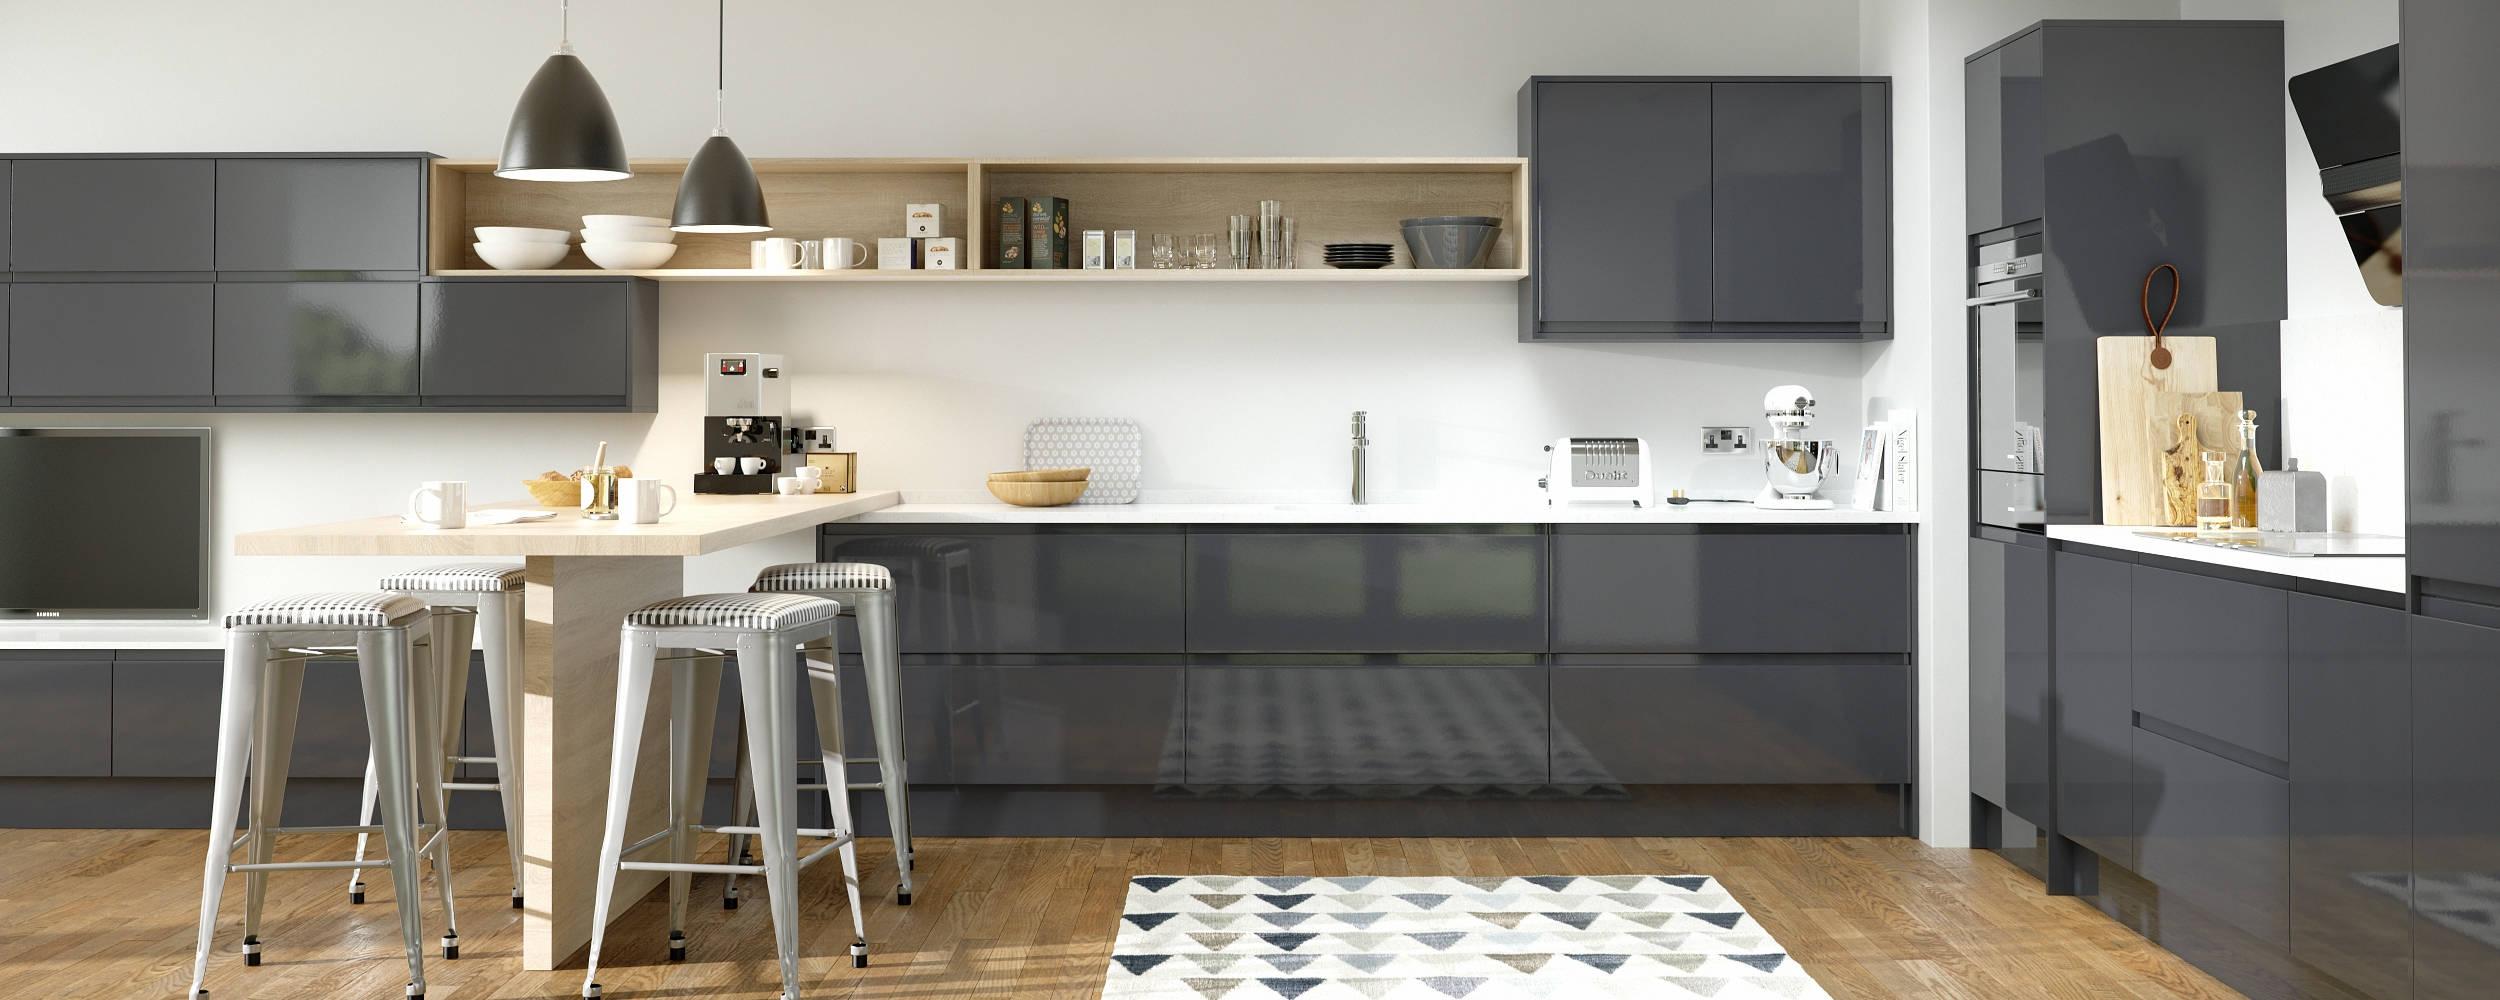 sheraton-line-kitchen-scotland